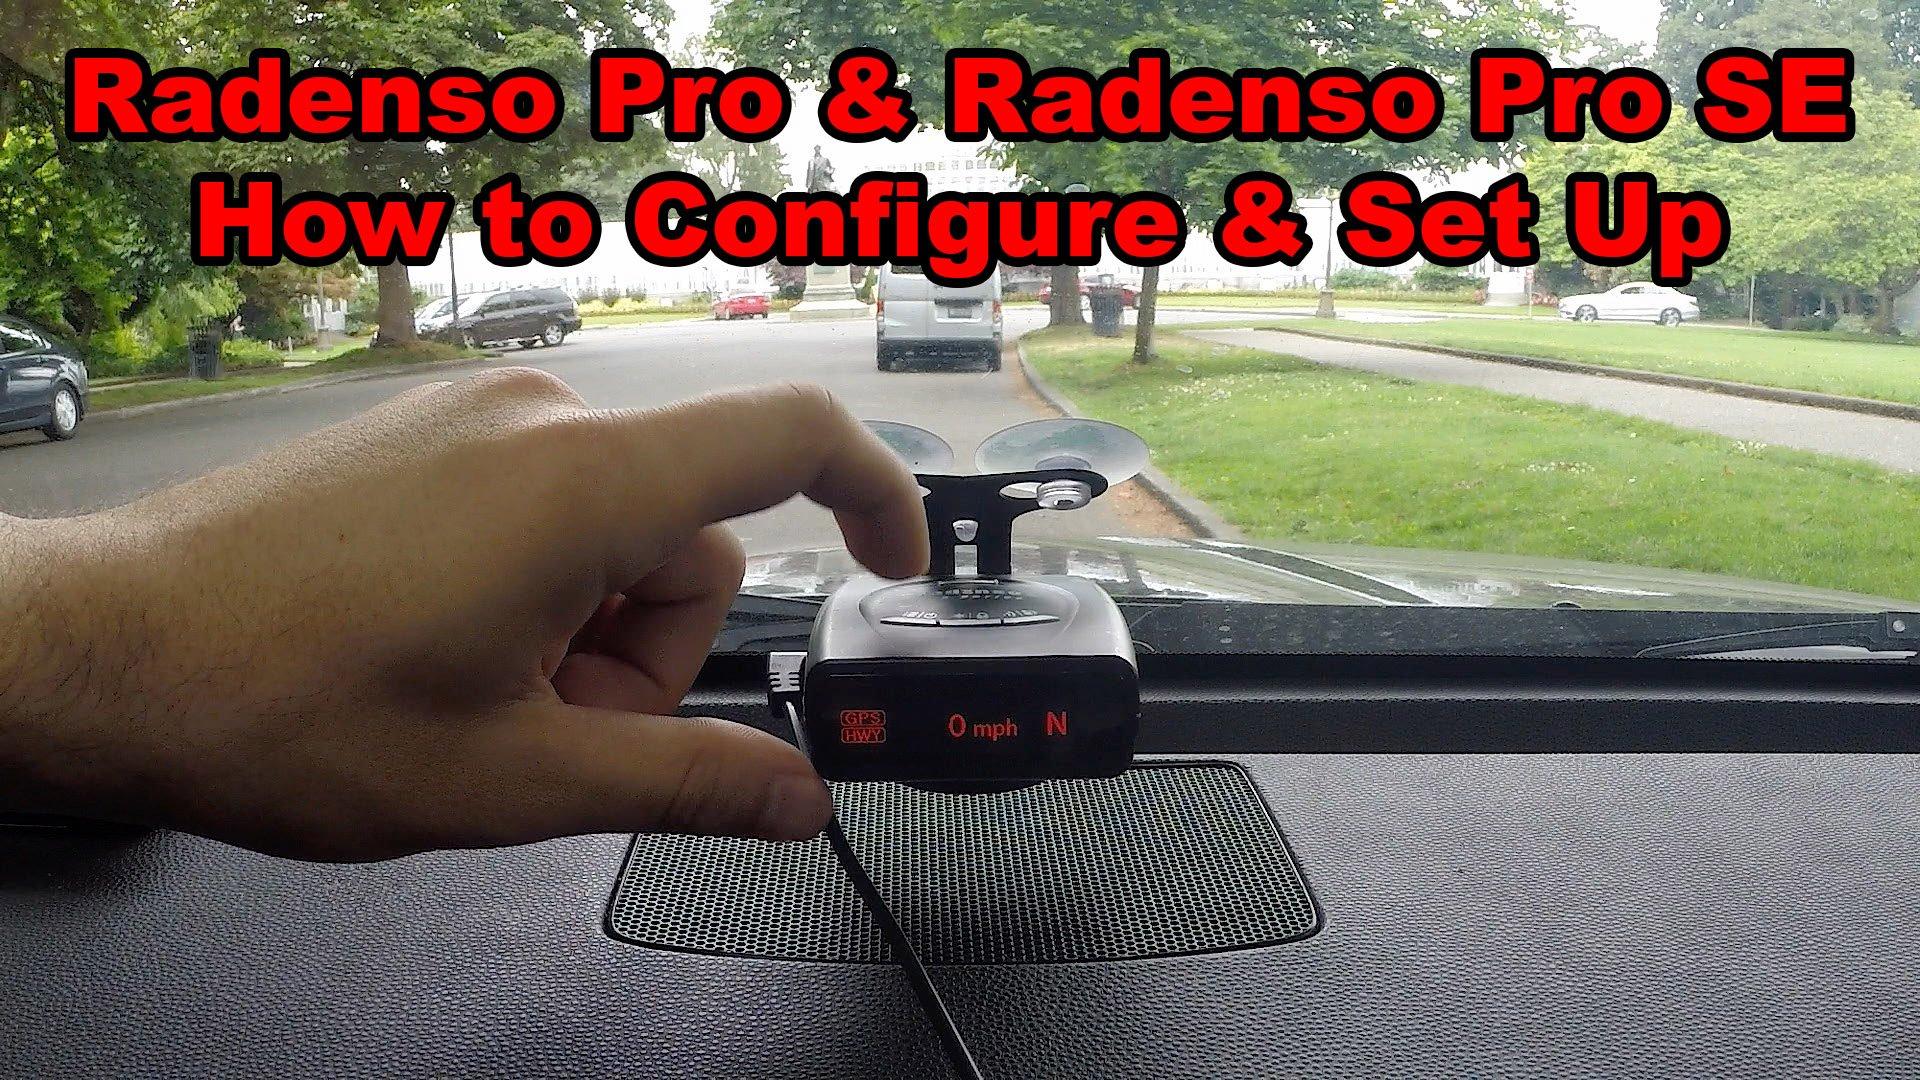 How to Set Up & Configure the Radenso Pro & Radenso Pro SE